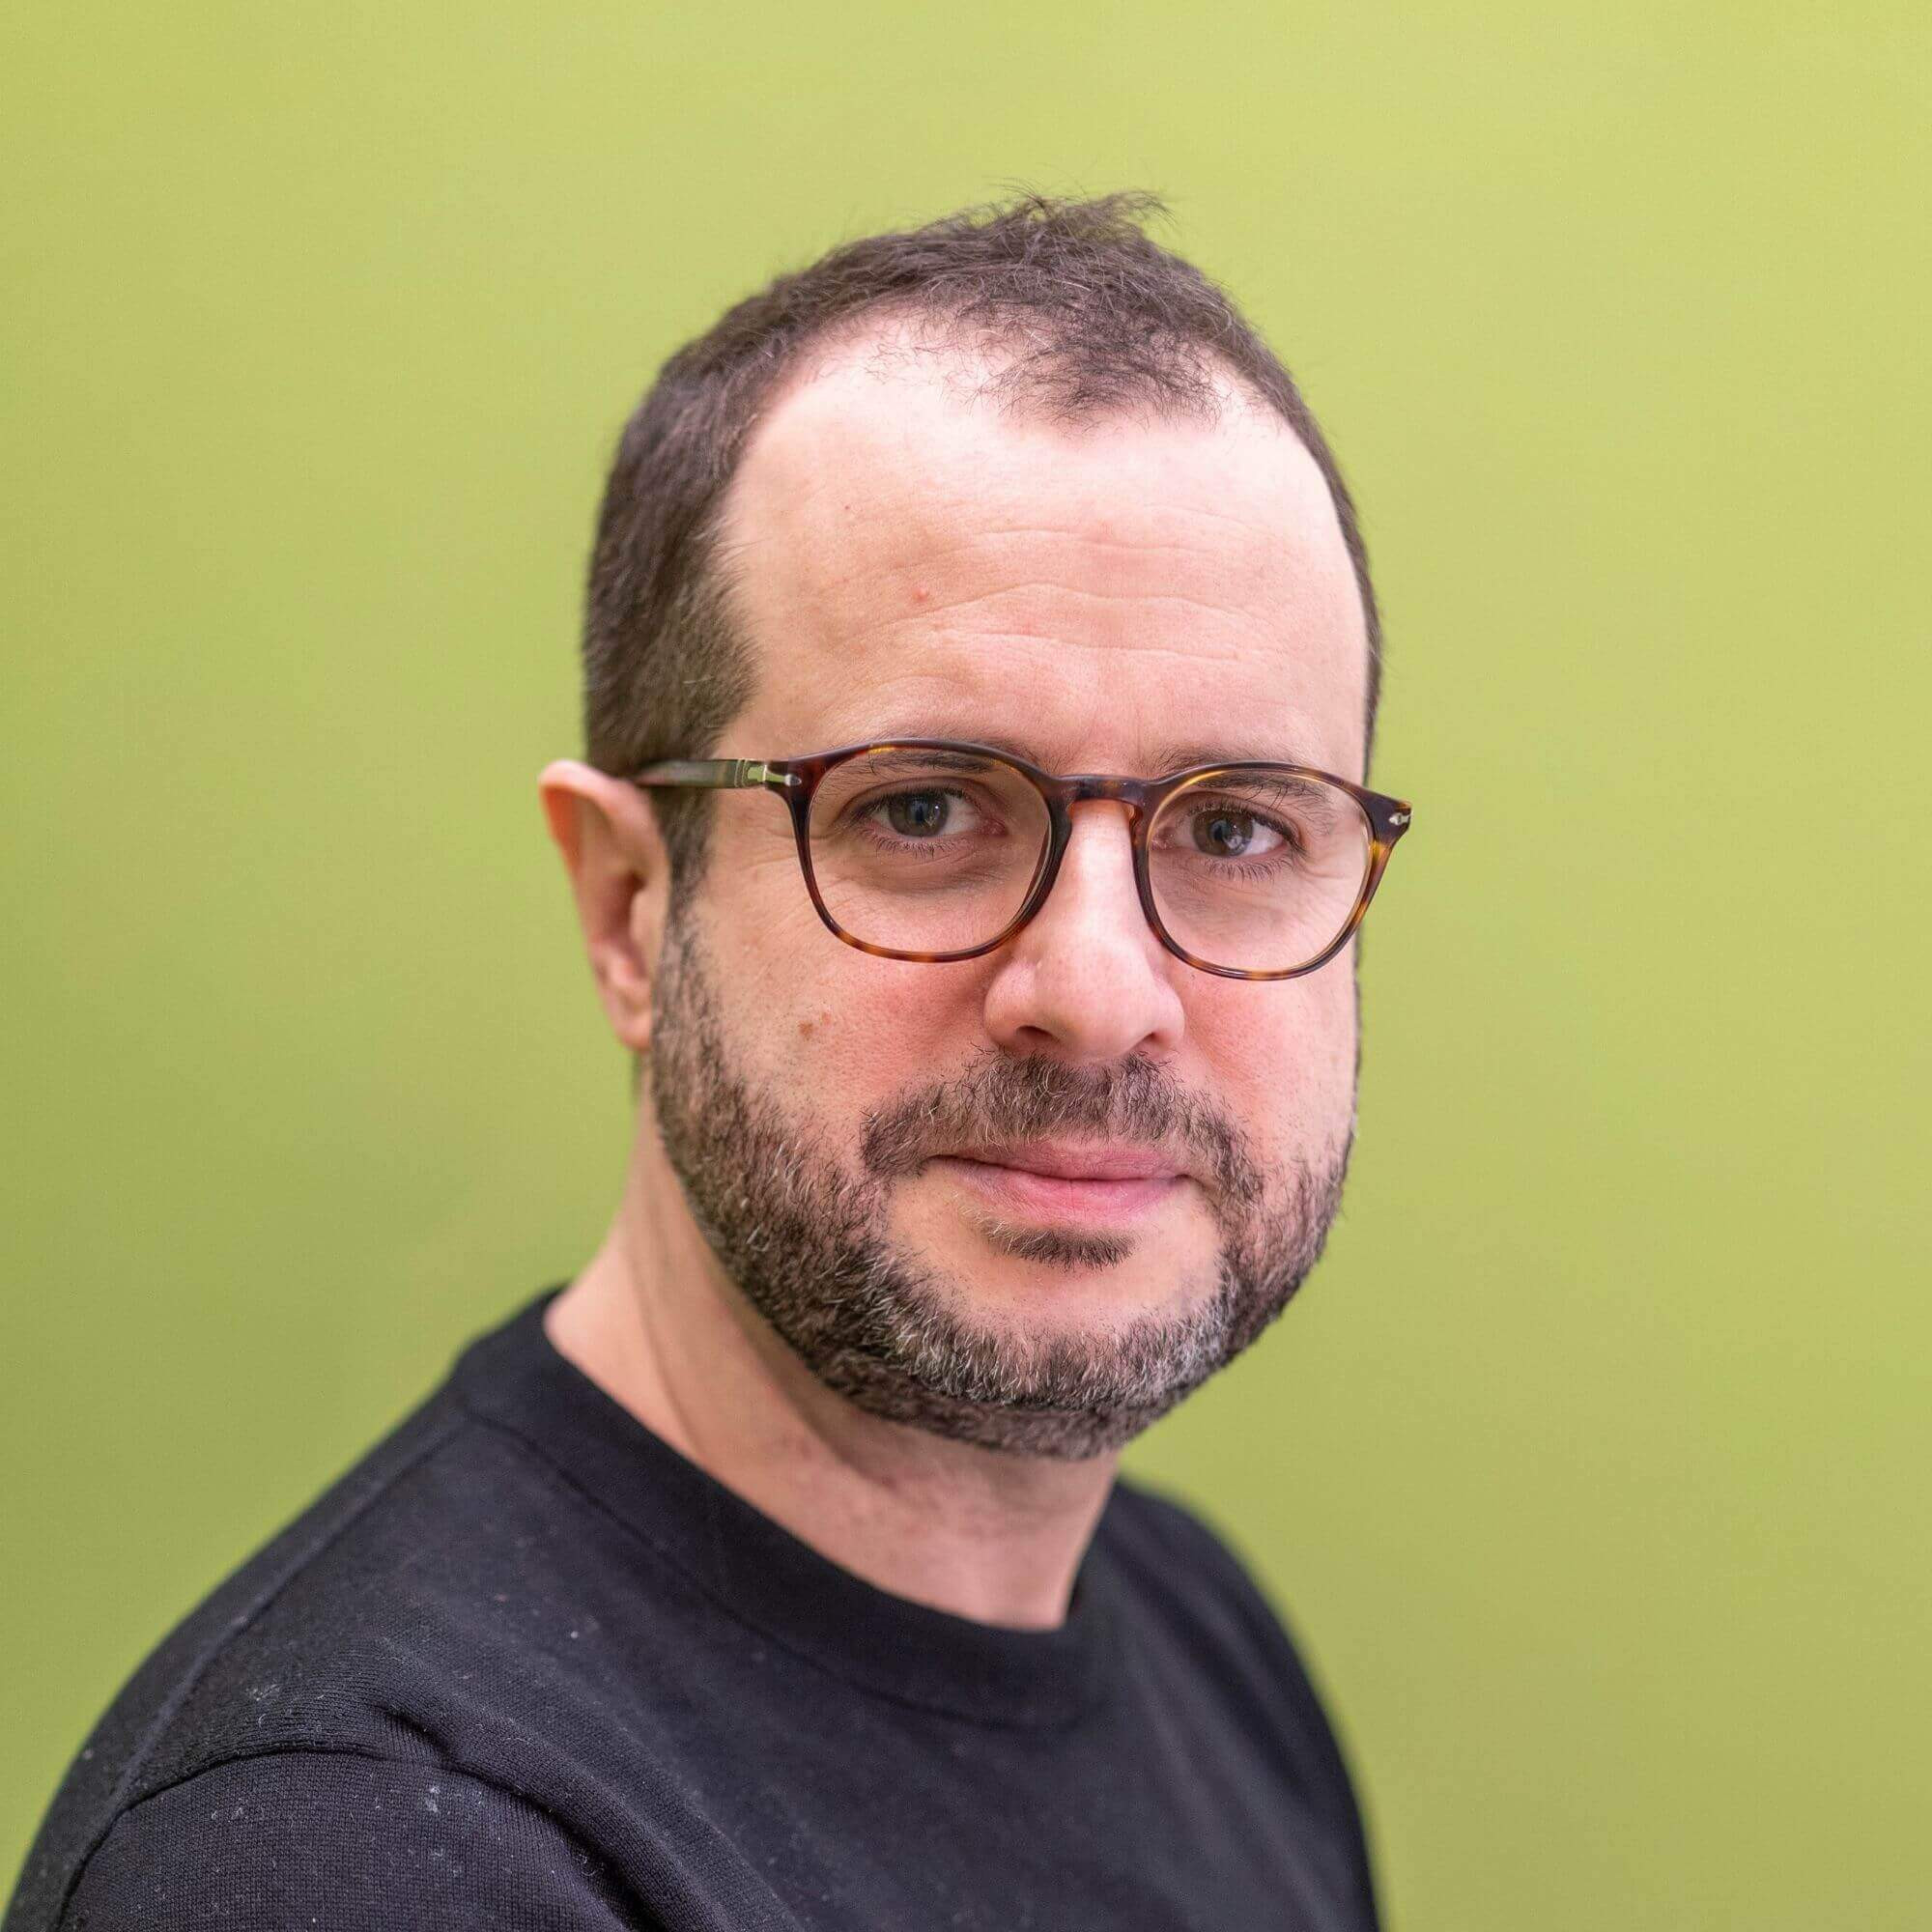 Antoine Heftler - Entrepreneur au pays des licornes